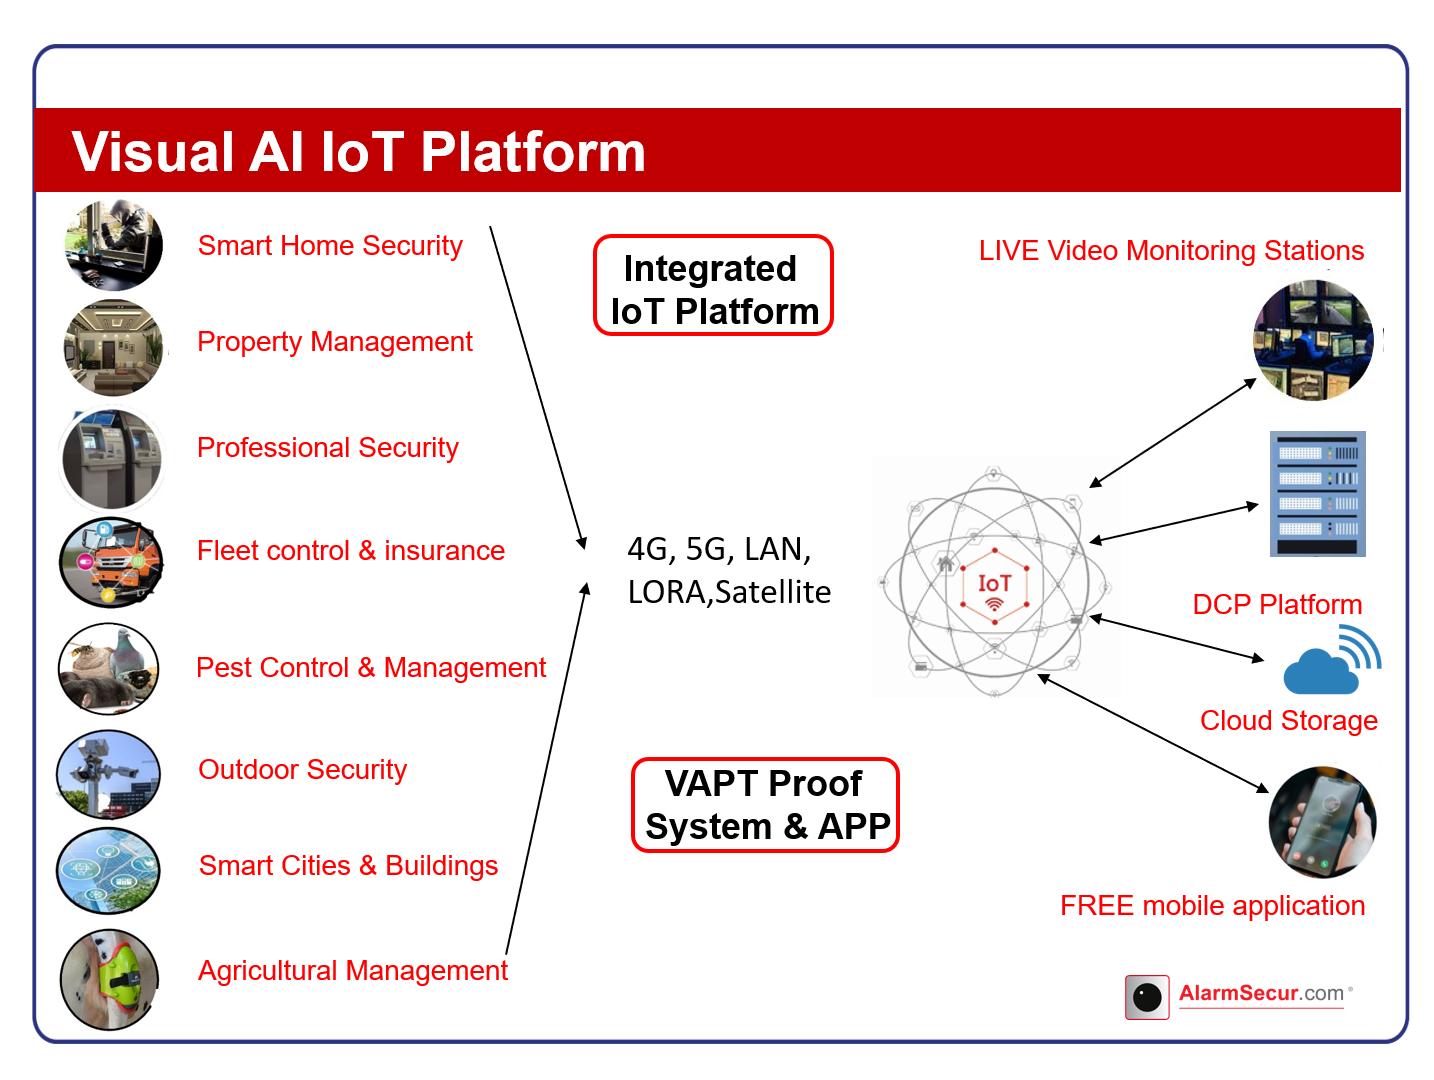 Visual AI IoT Platform